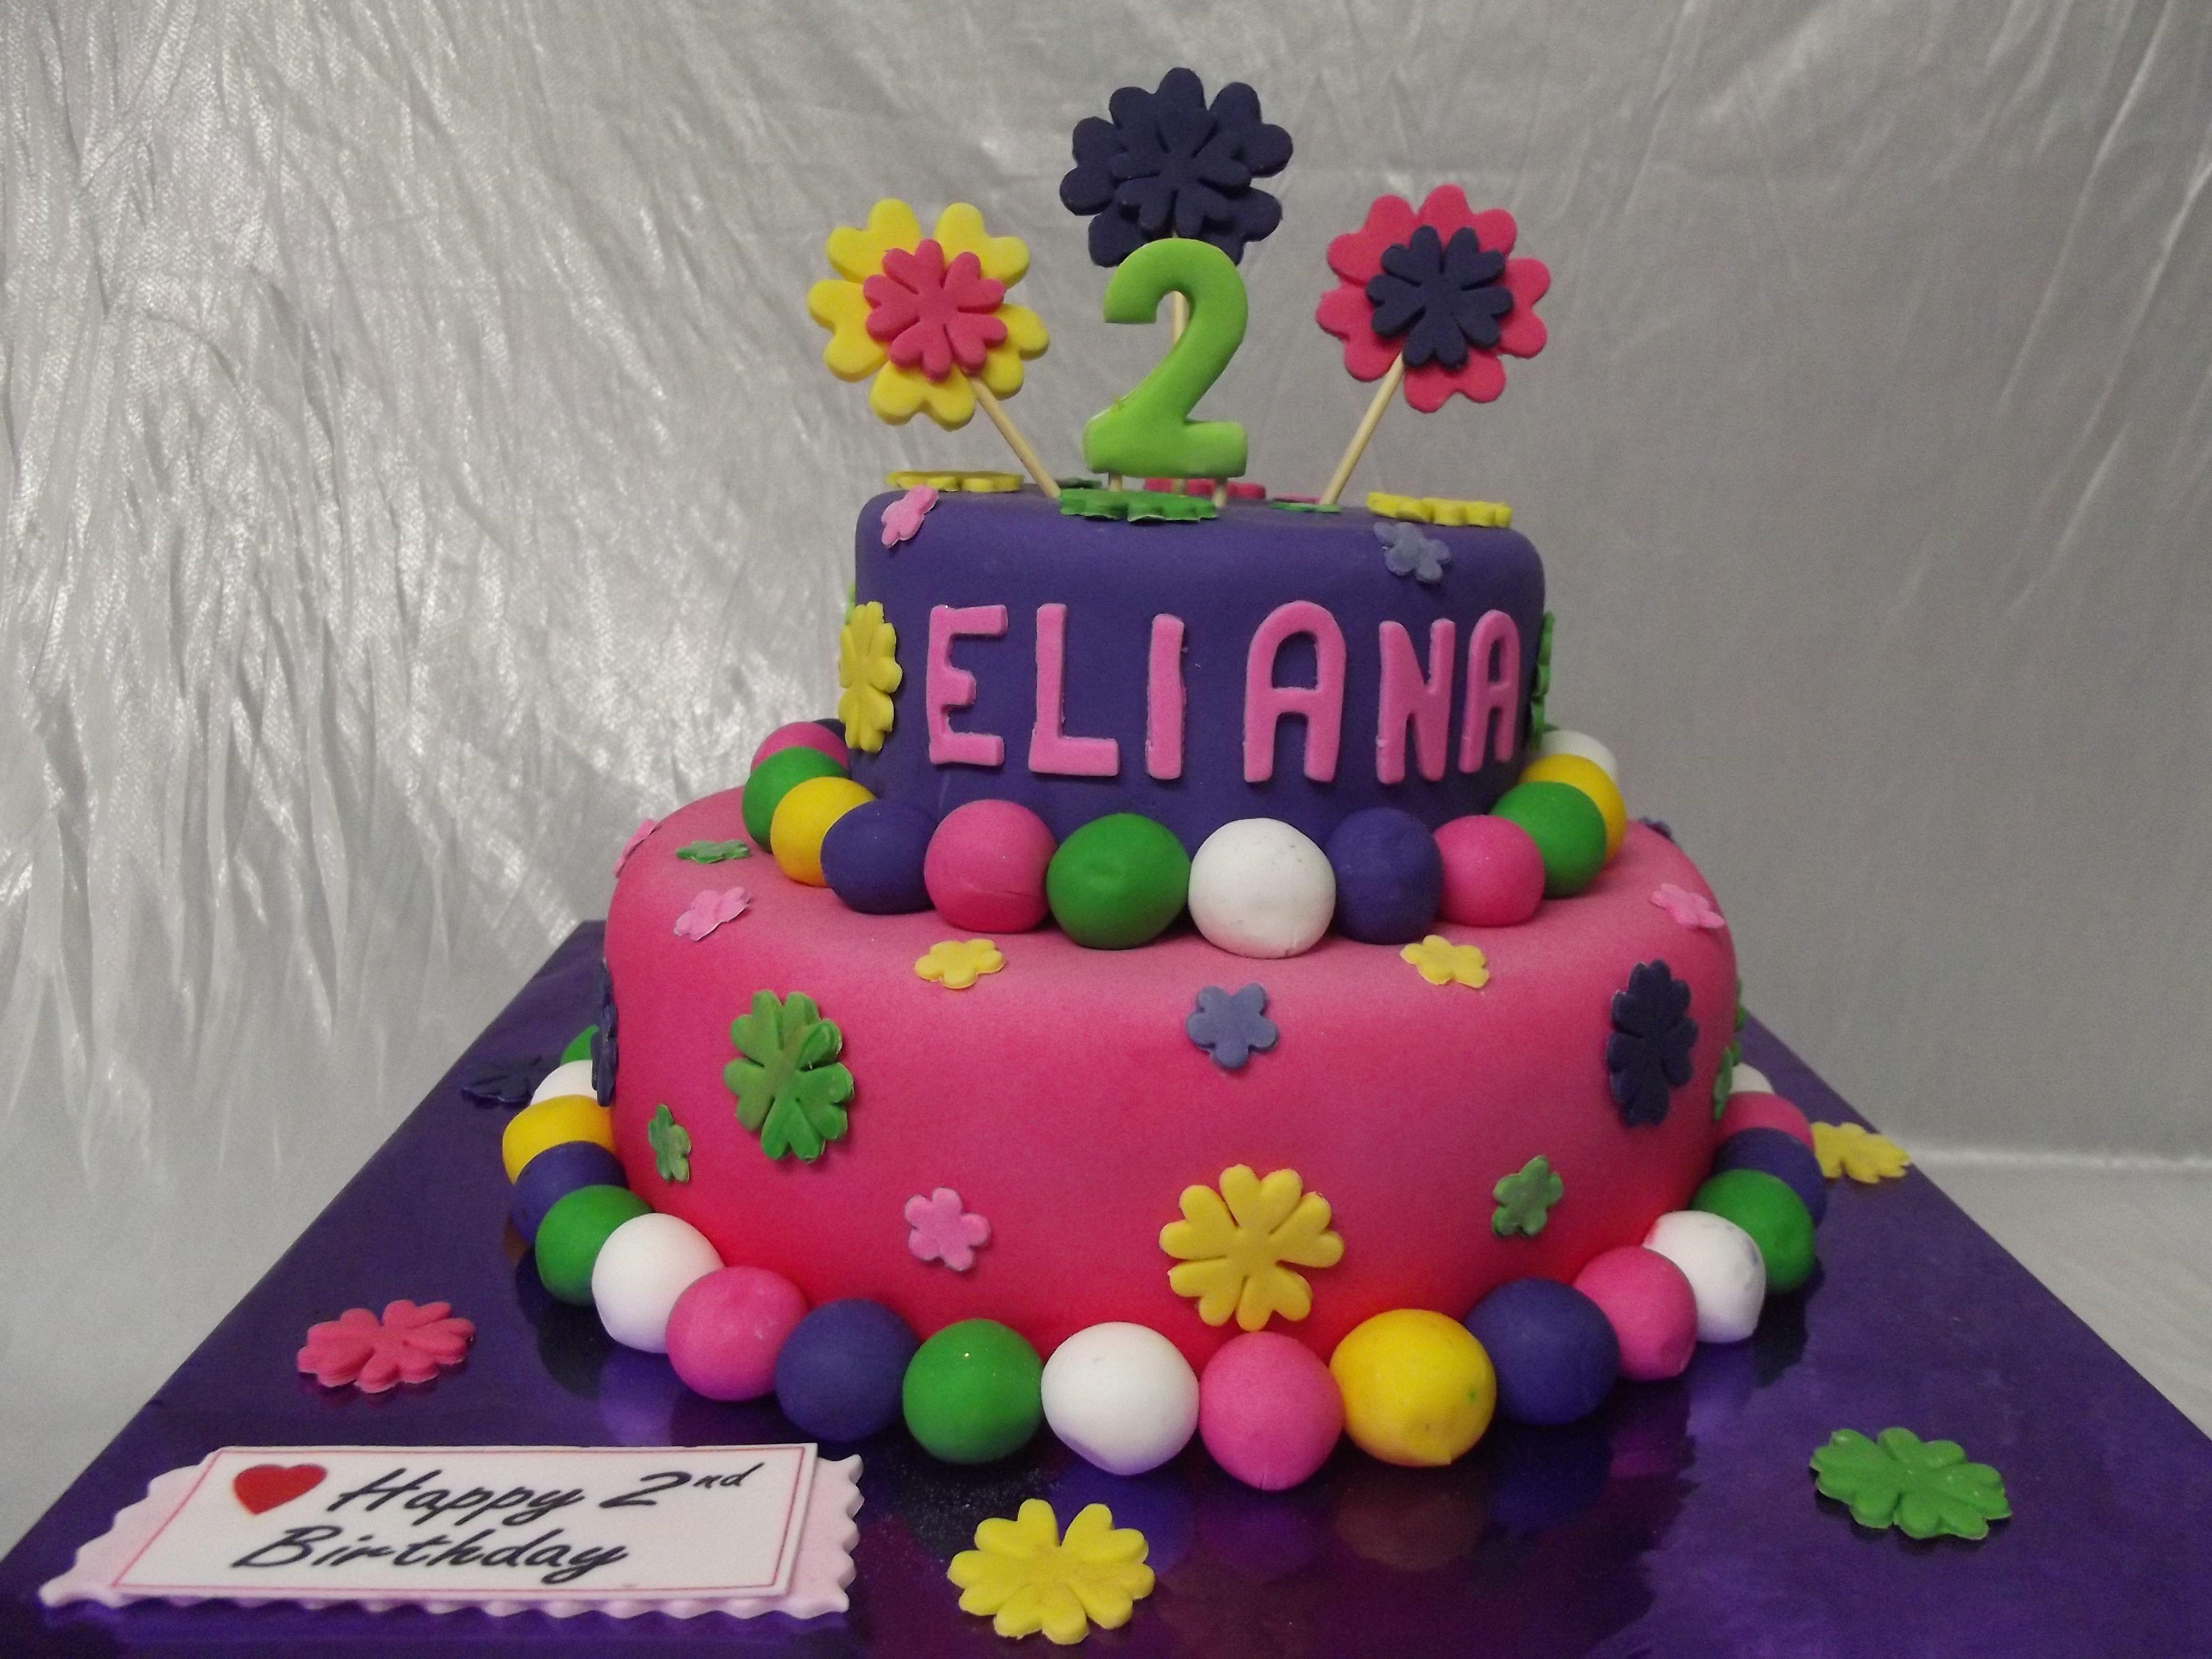 wwwfrescofoodsconz occasion cakes in Auckland New Zealand fluro